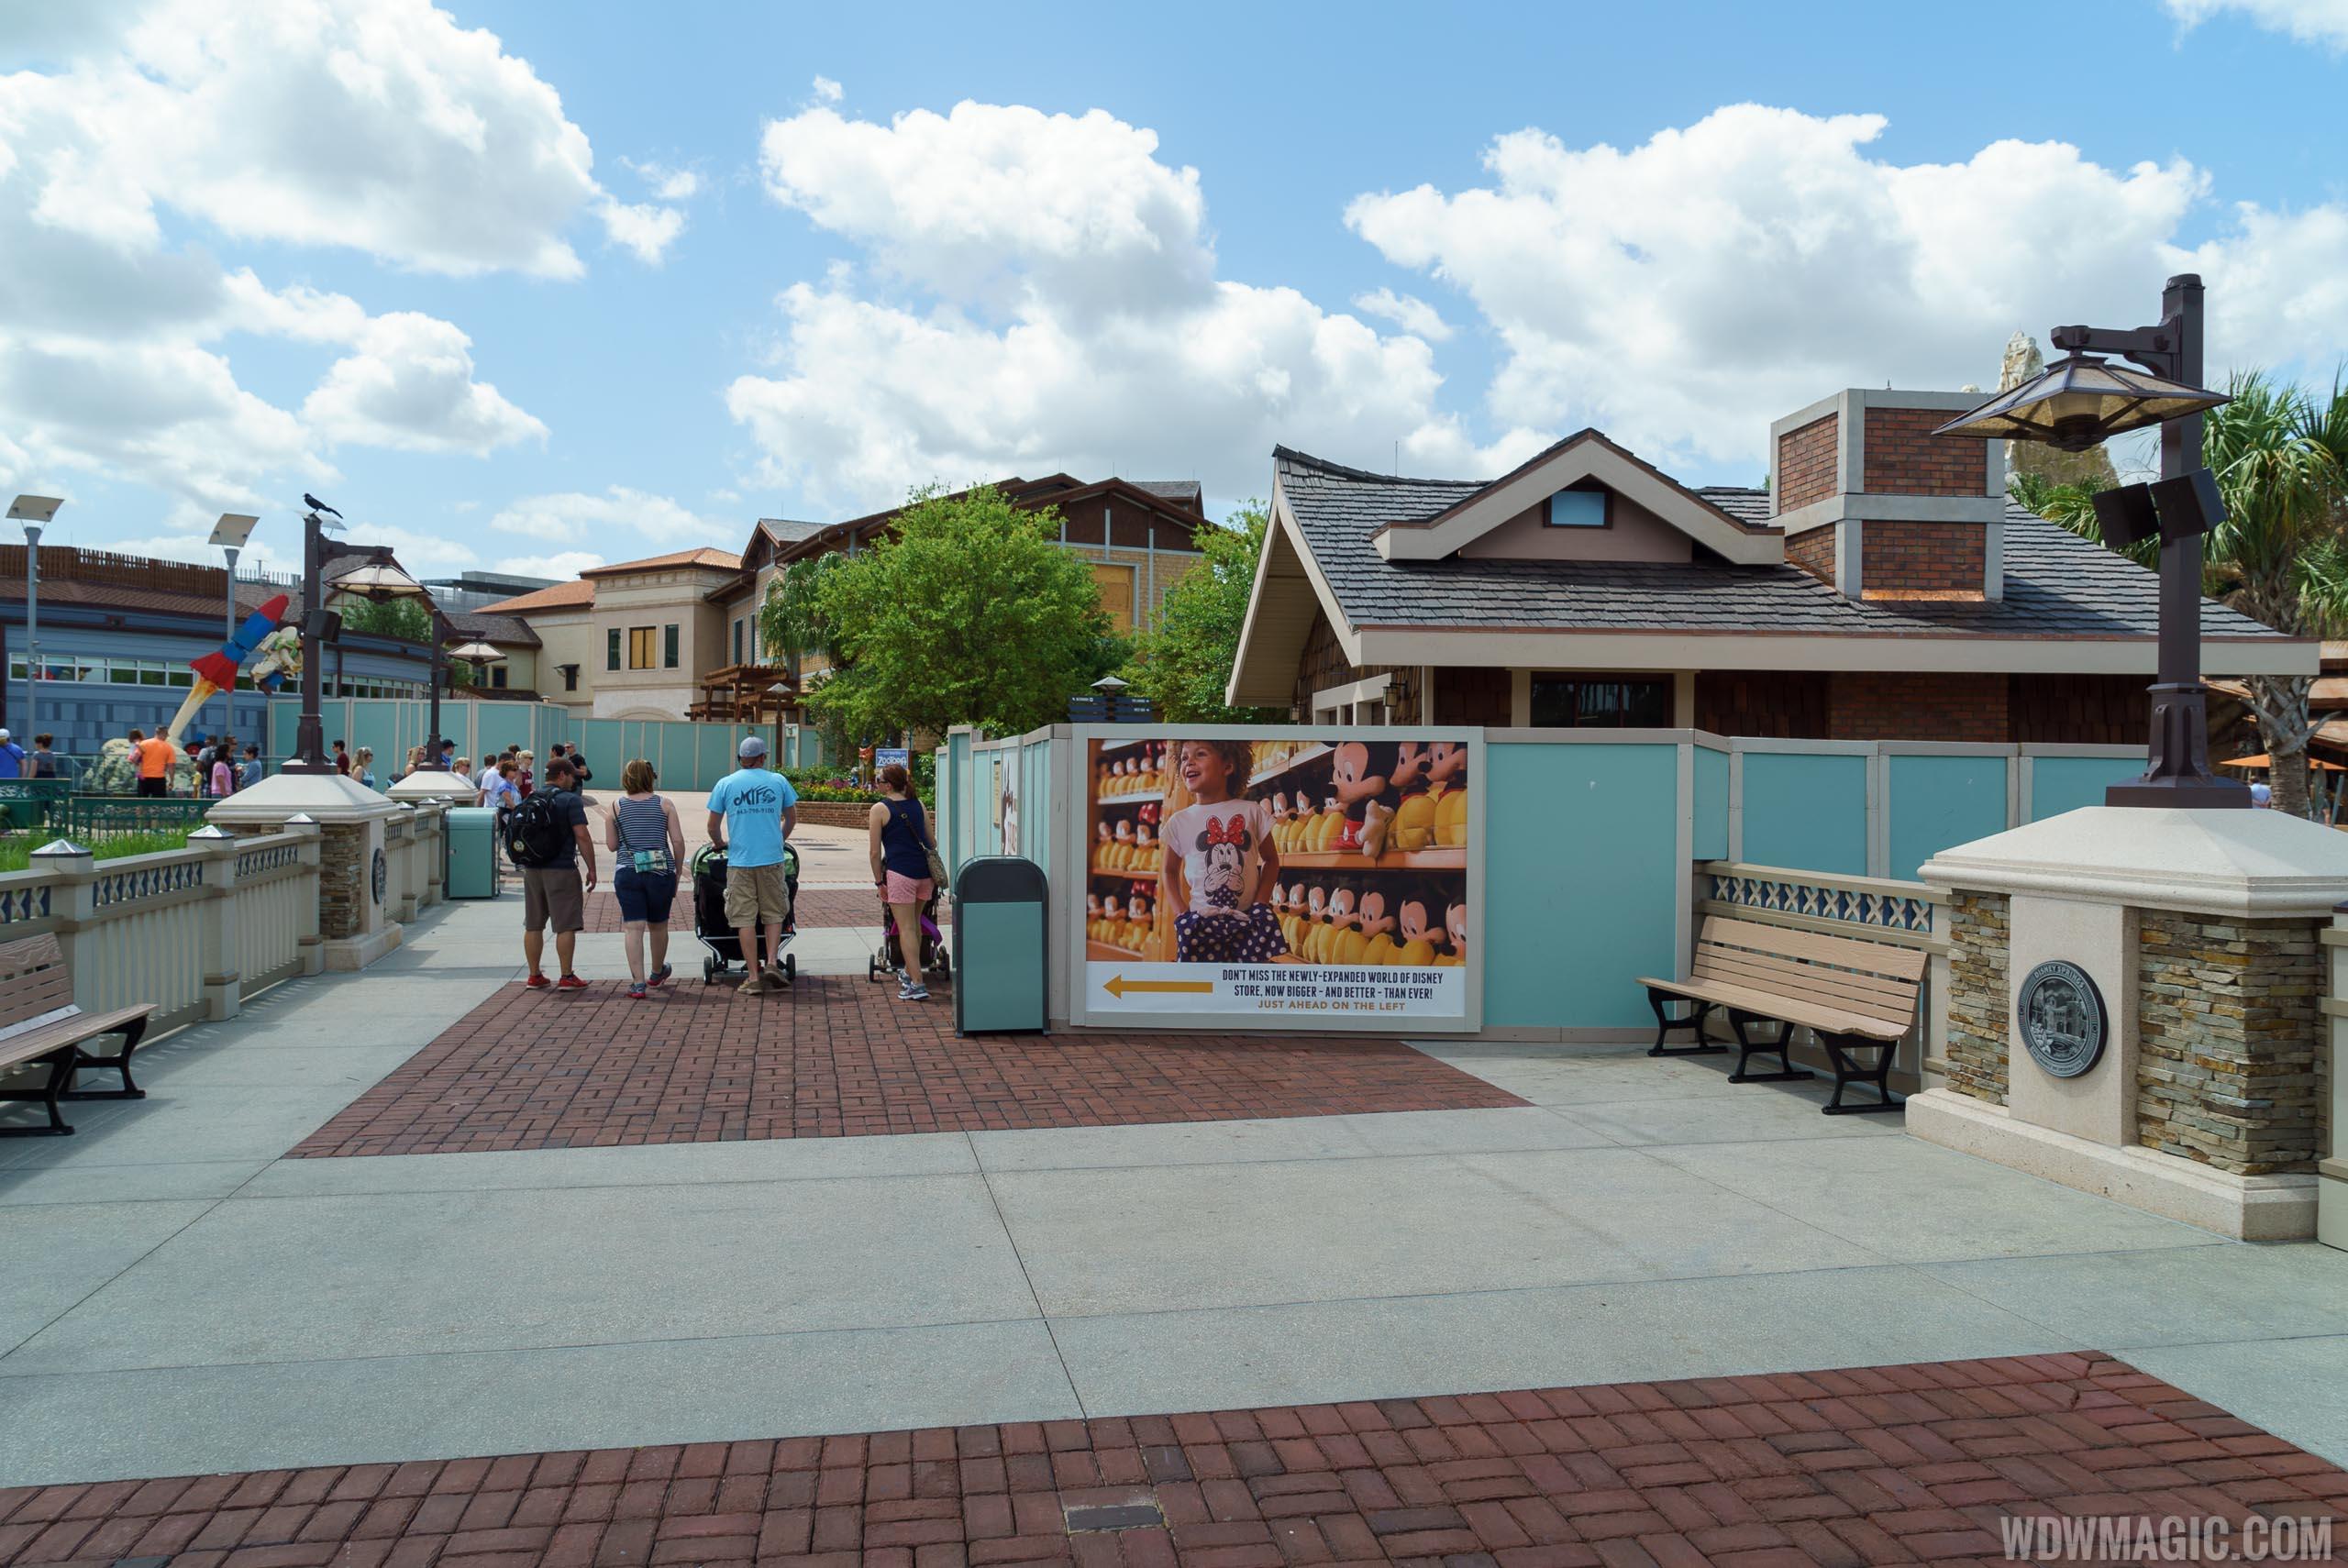 B.B. Wolf's Sausage Co. on the Marketplace causeway